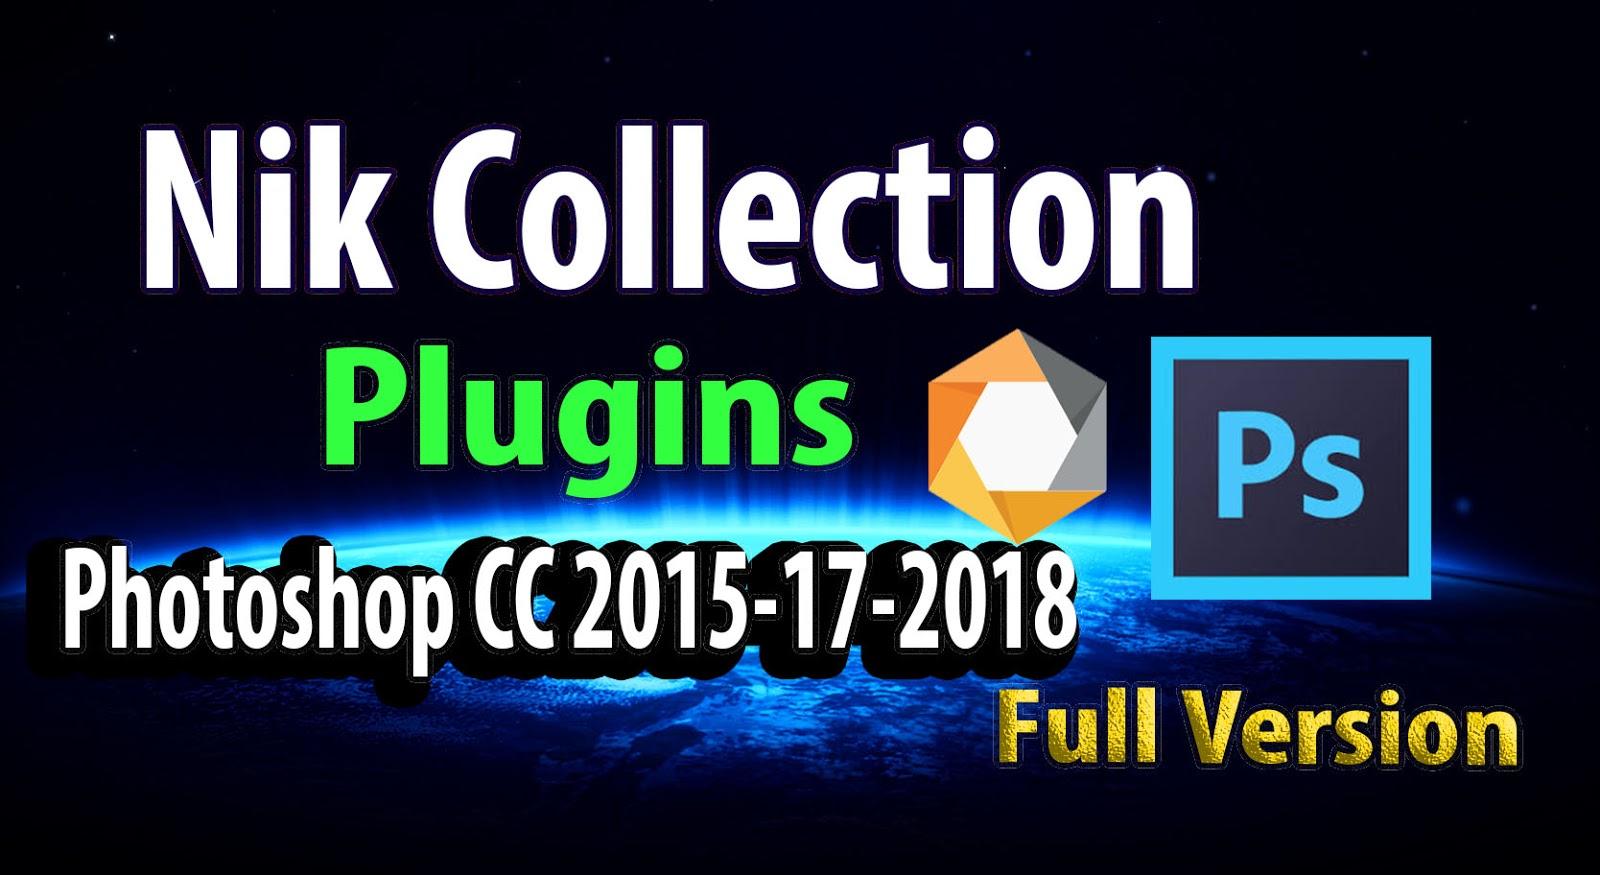 nik collection photoshop cc download